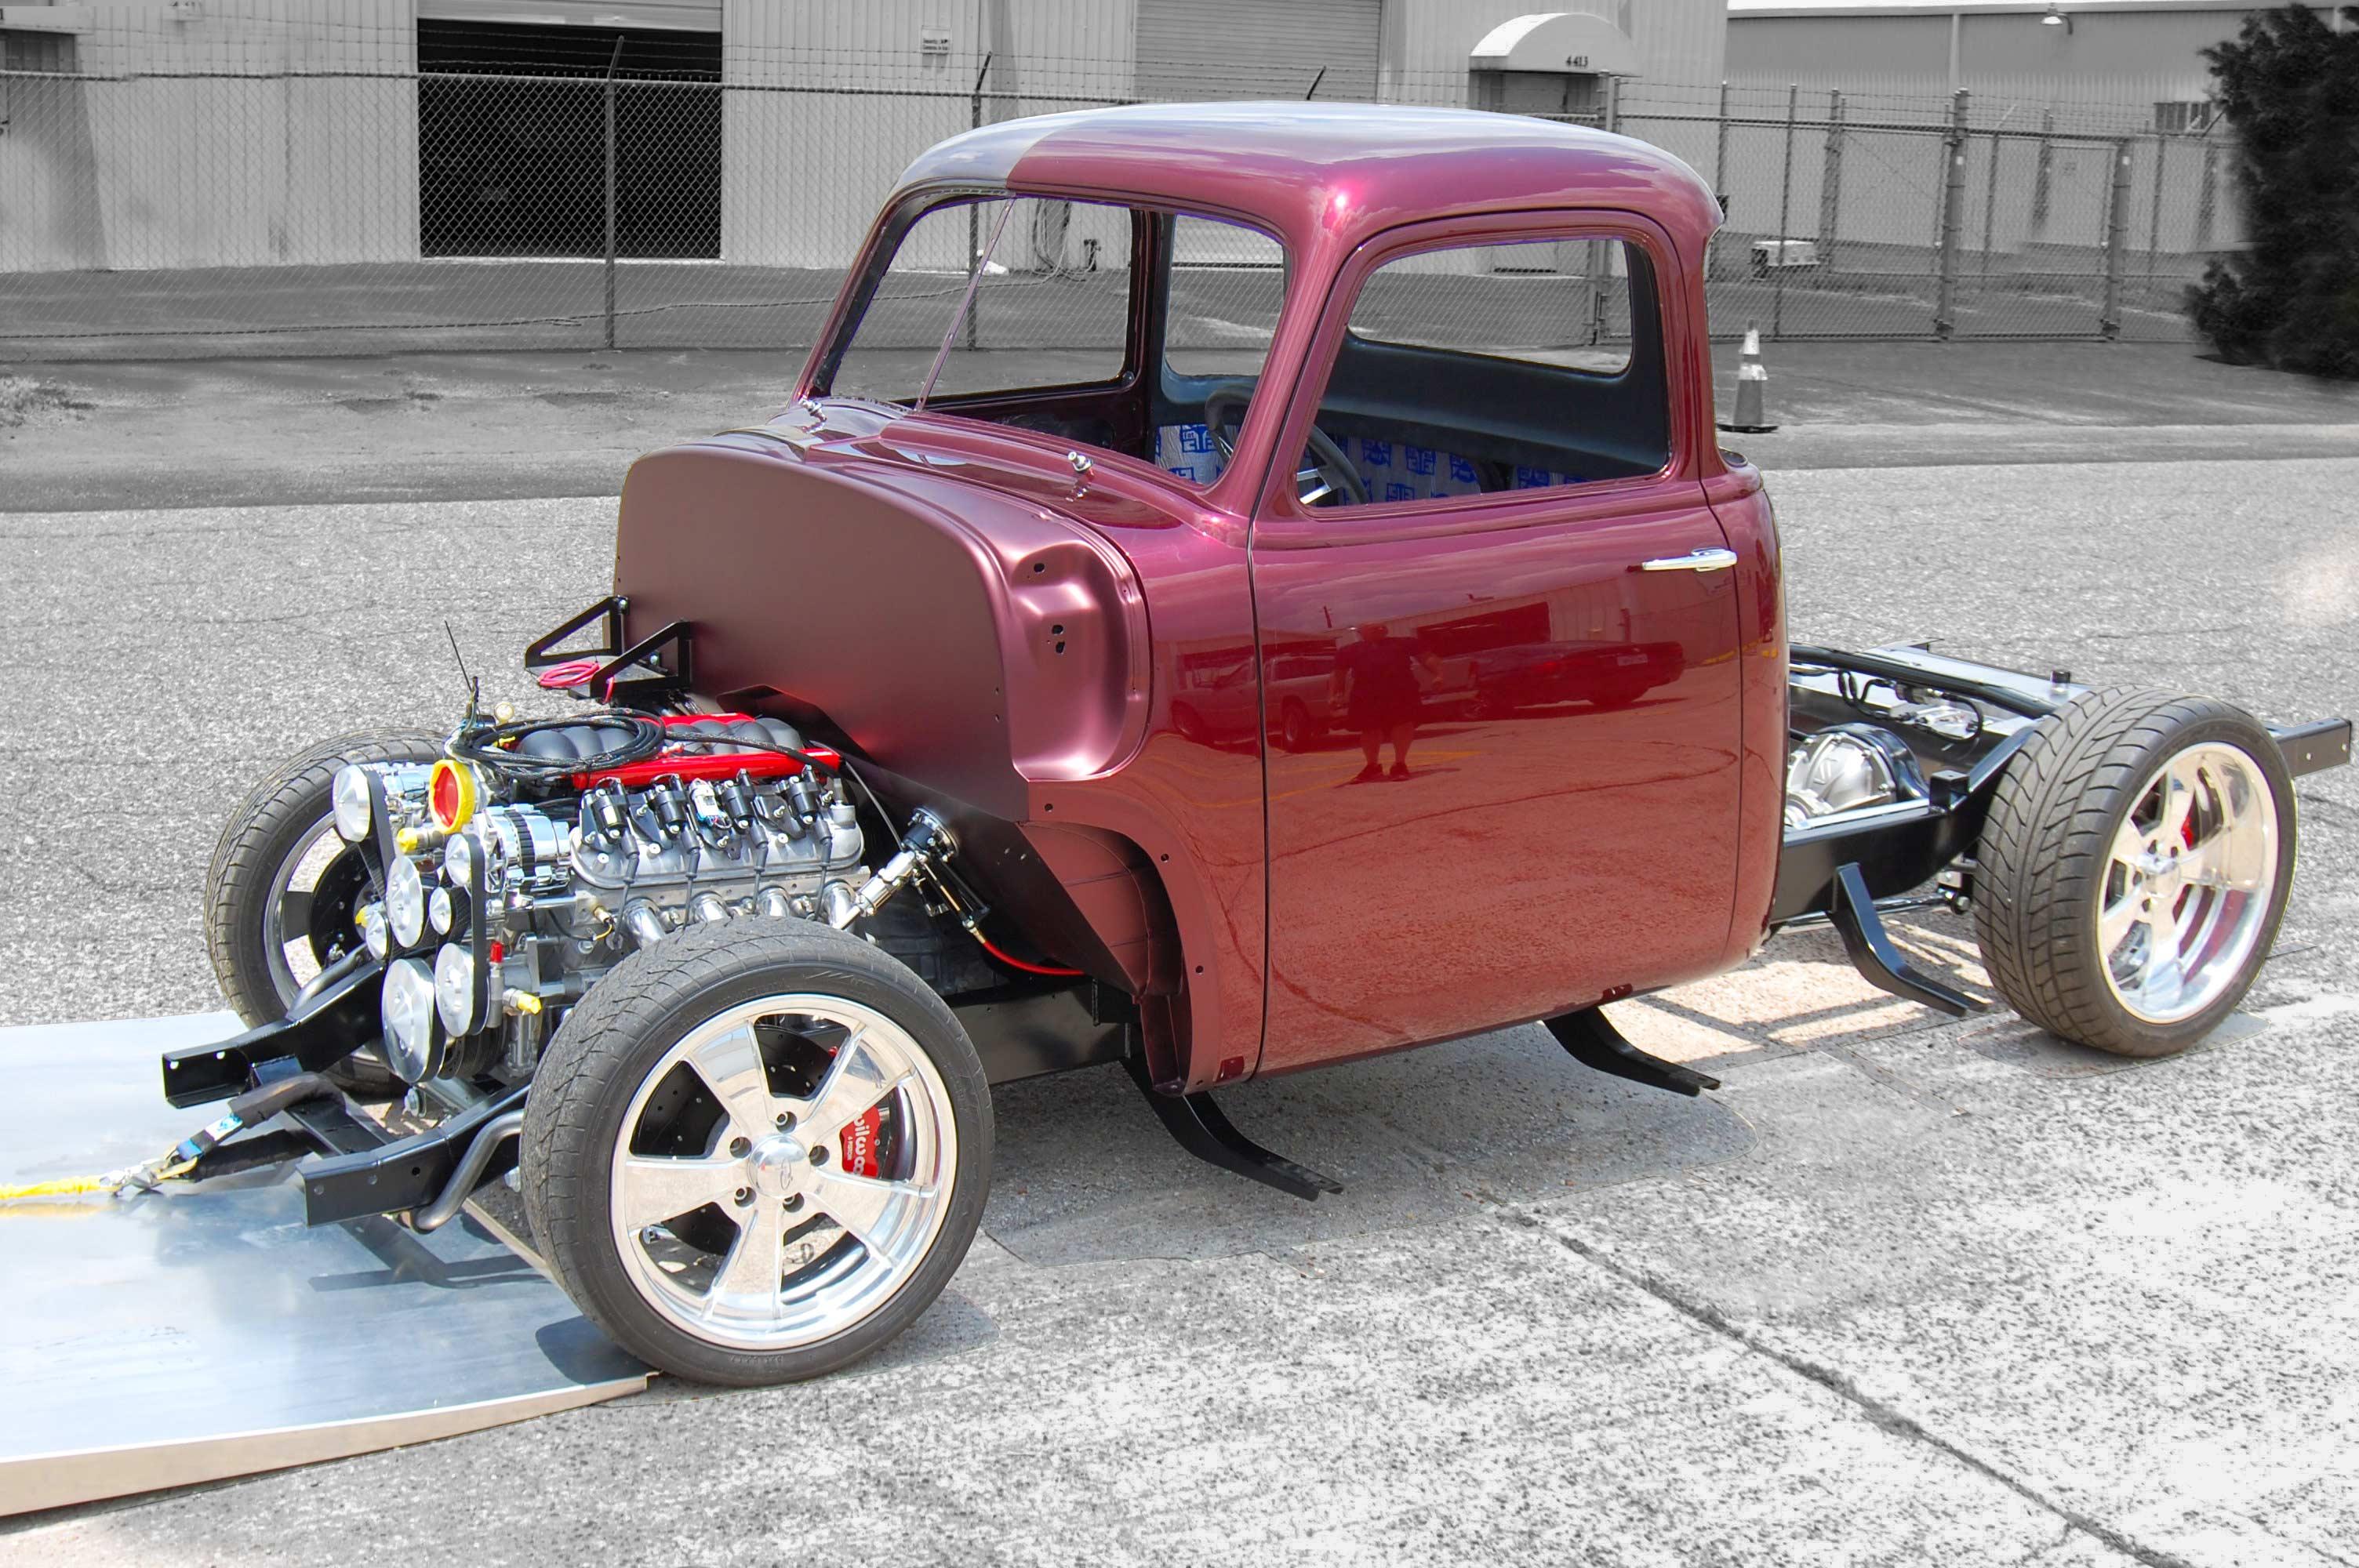 51 Chevy Truck